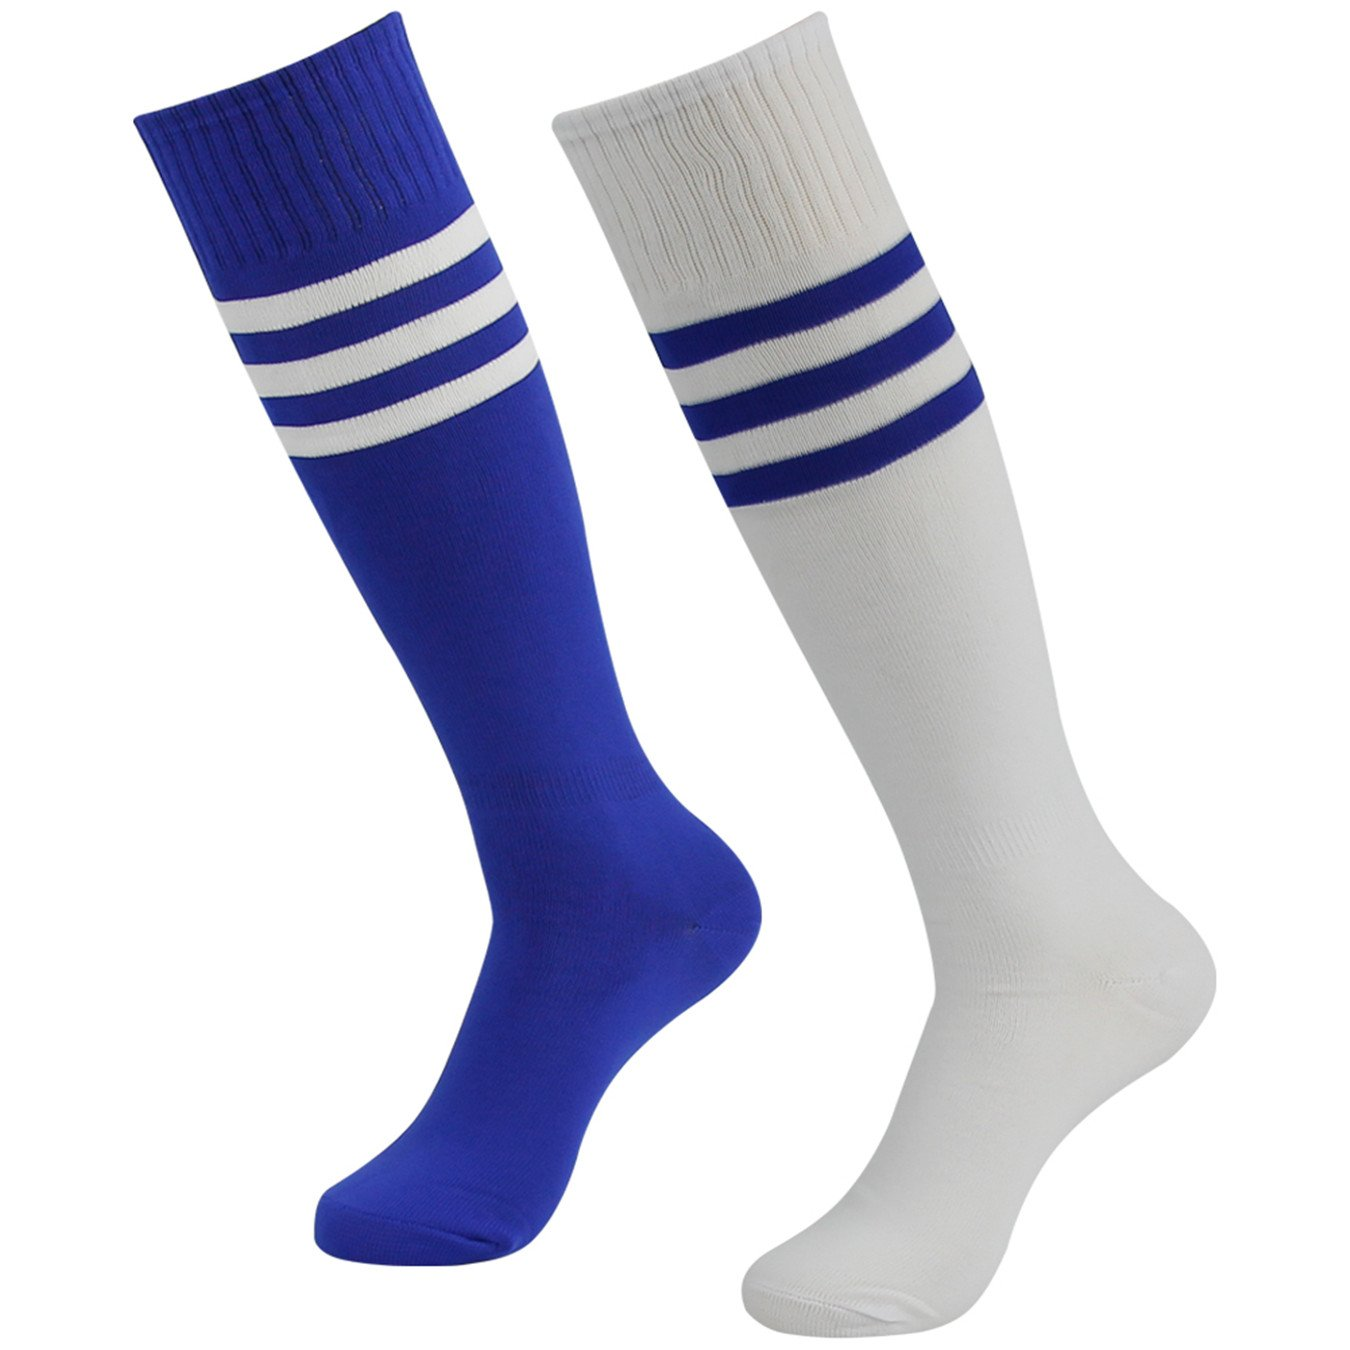 3street ユニセックス ニーハイ トリプルストライプ アスレチック サッカー チューブ ソックス 2 / 6 / 10組 B07C6BZZPZ 01#2 Pair White+Blue Stripe&Blue+White Stripe 01#2 Pair White+Blue Stripe&Blue+White Stripe